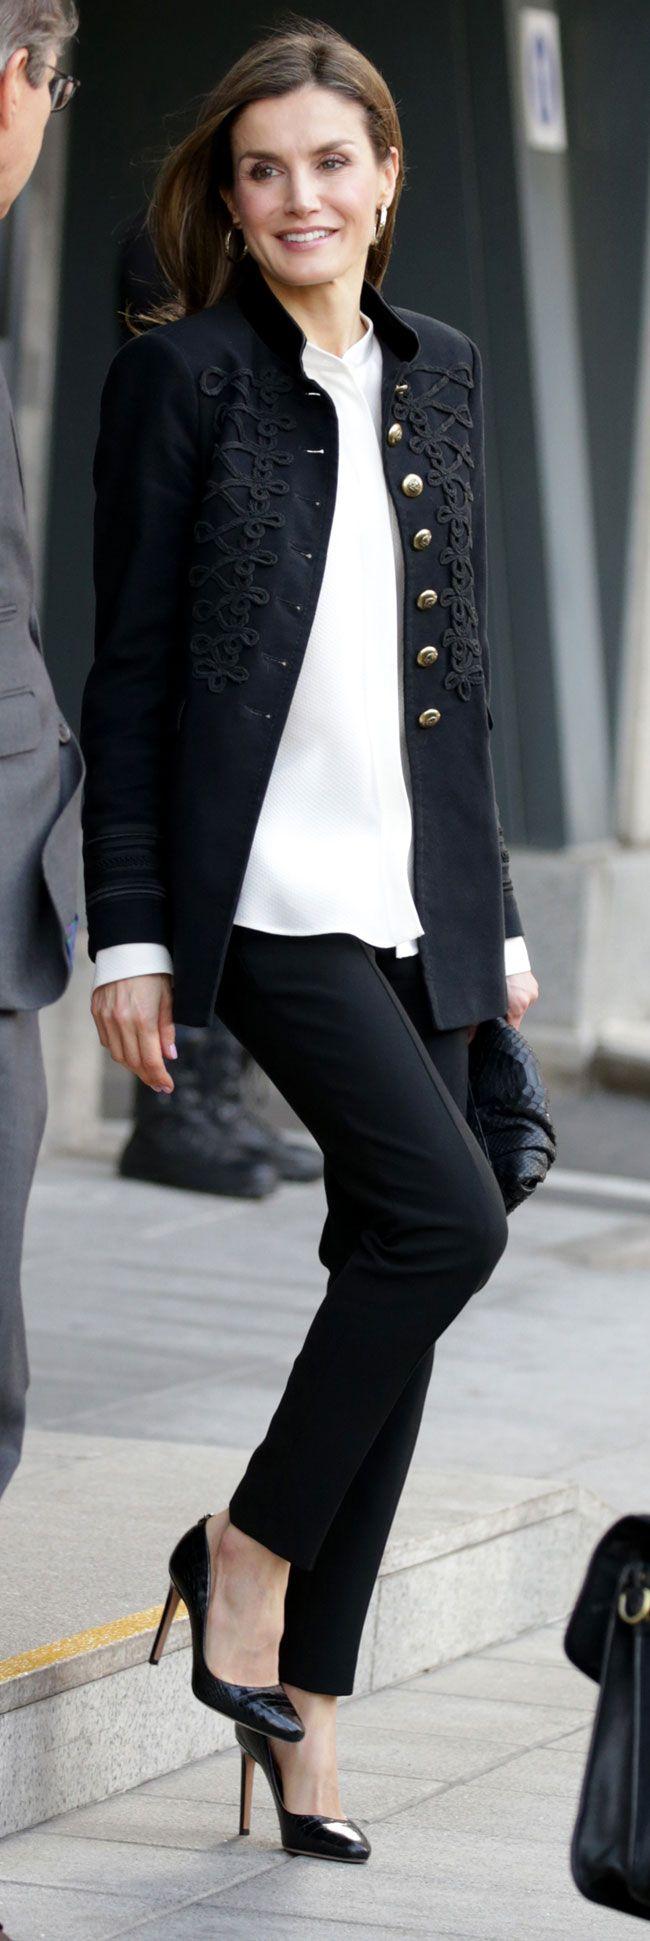 HM Queen Letizia of Spain in Madrid for a Fundéu BBVA meeting - Feb 2017